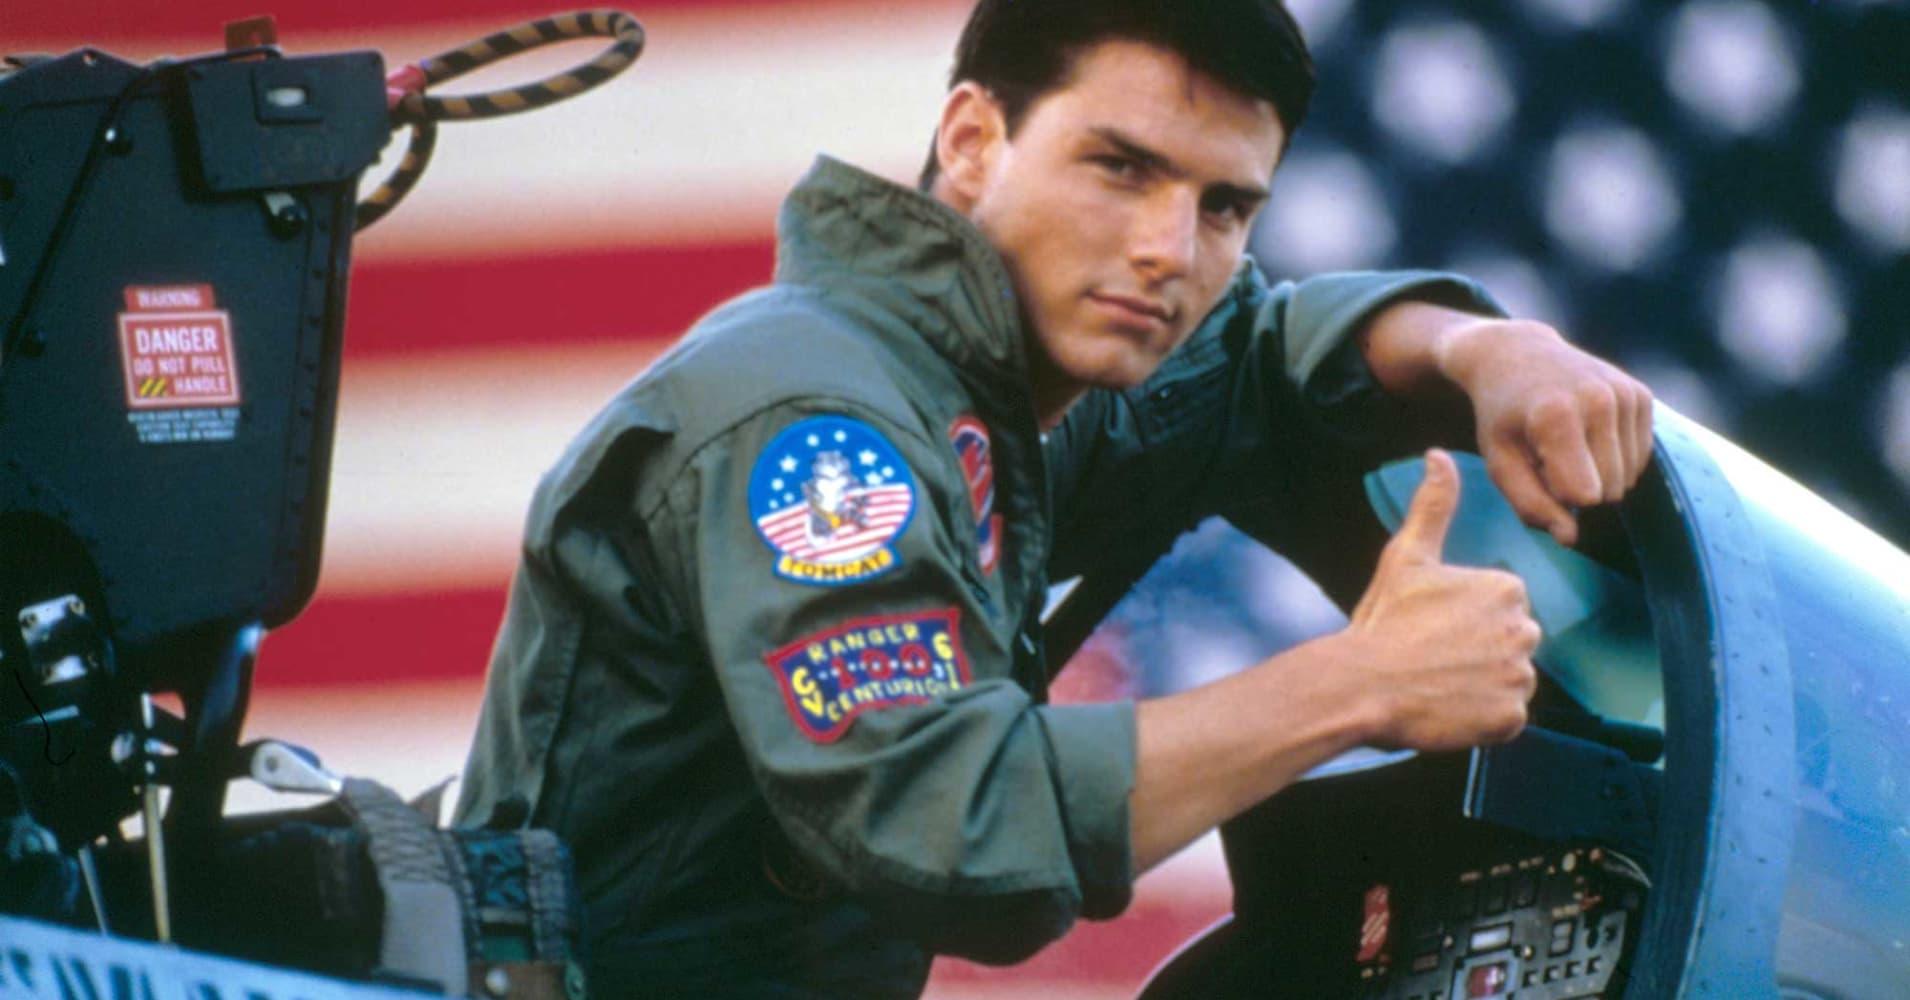 'Top Gun 2' is 'definitely happening,' according to Tom Cruise